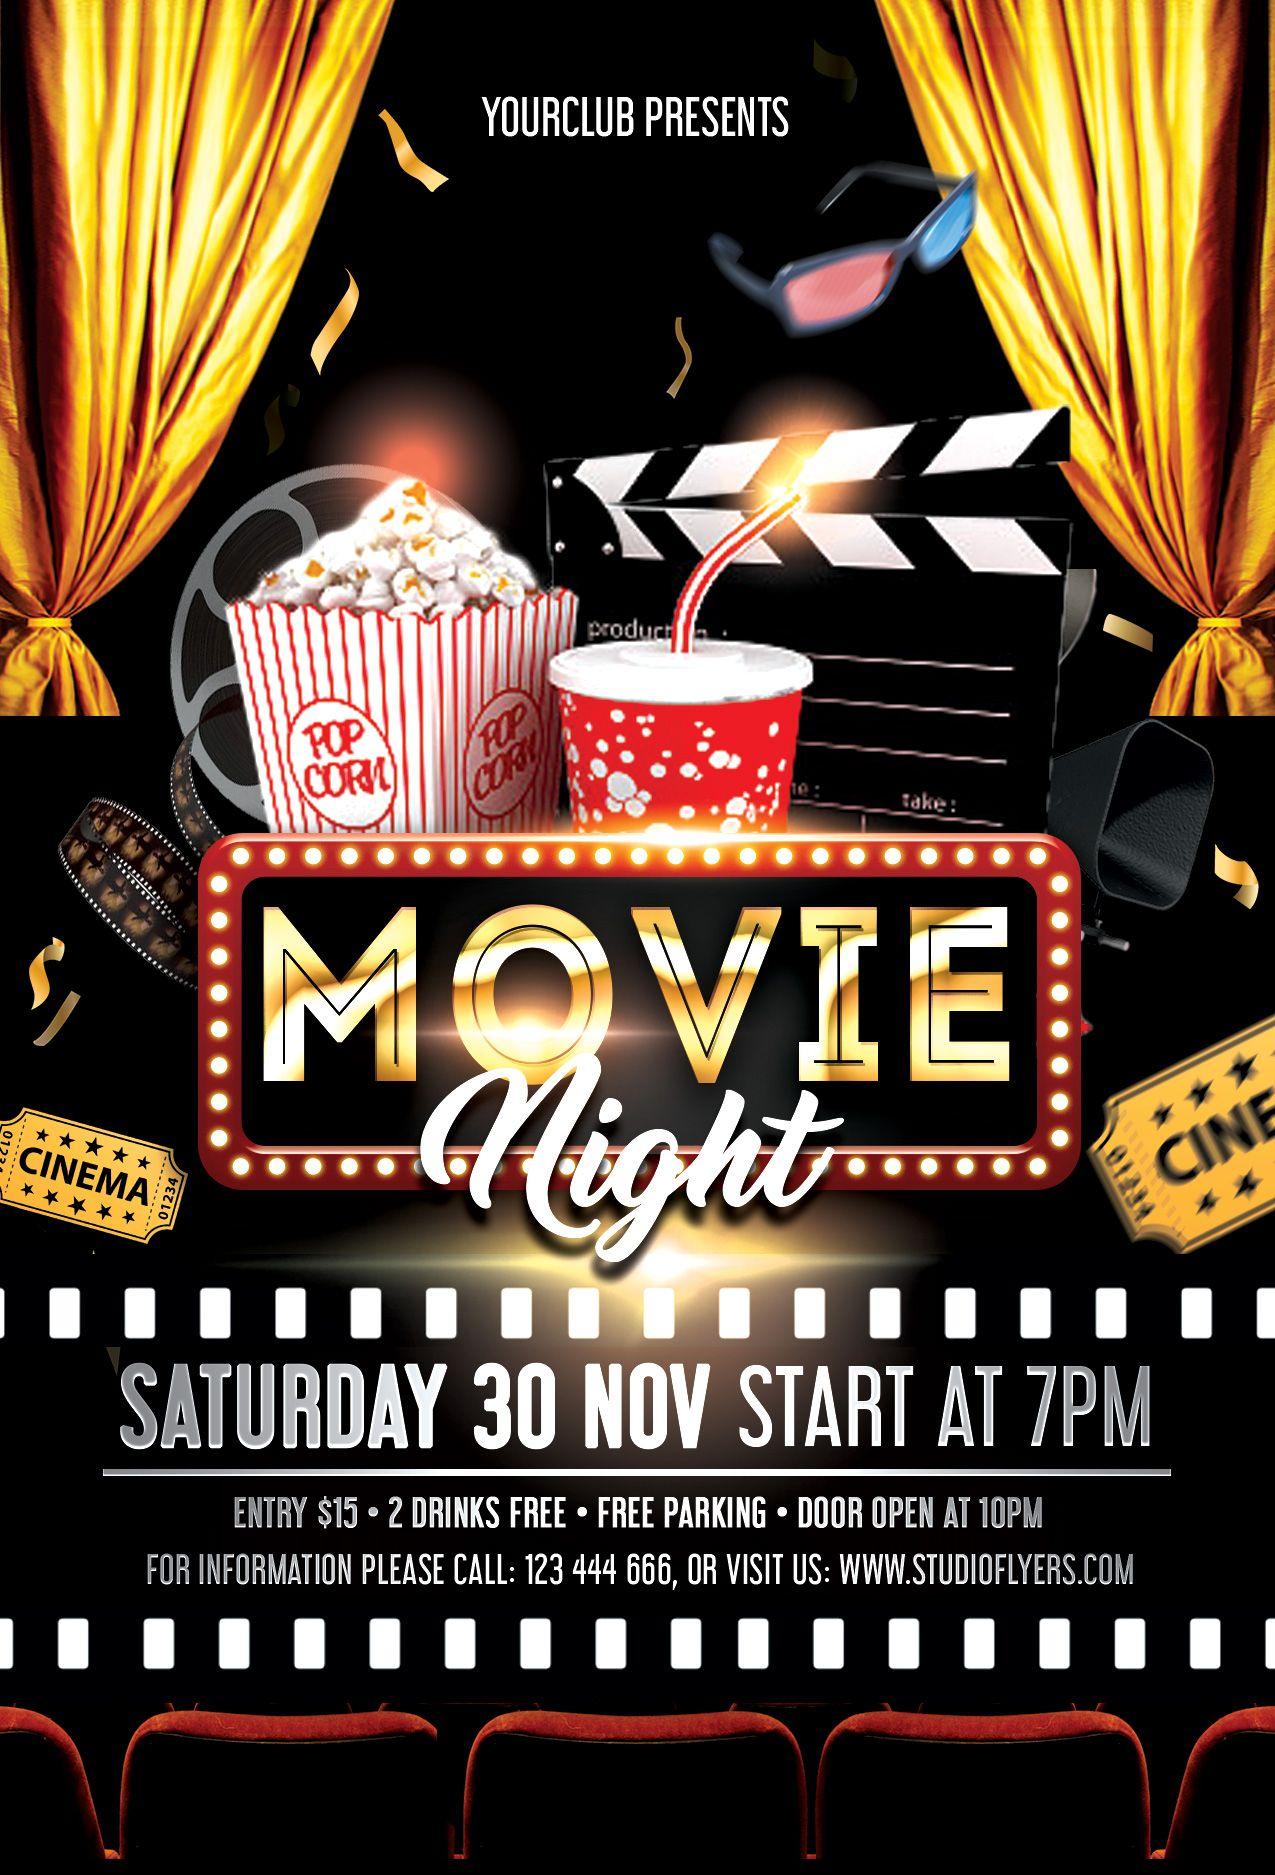 Movie Night Free Psd Flyer Template Studioflyers Com Free Psd Flyer Templates Movie Night Flyer Free Psd Flyer